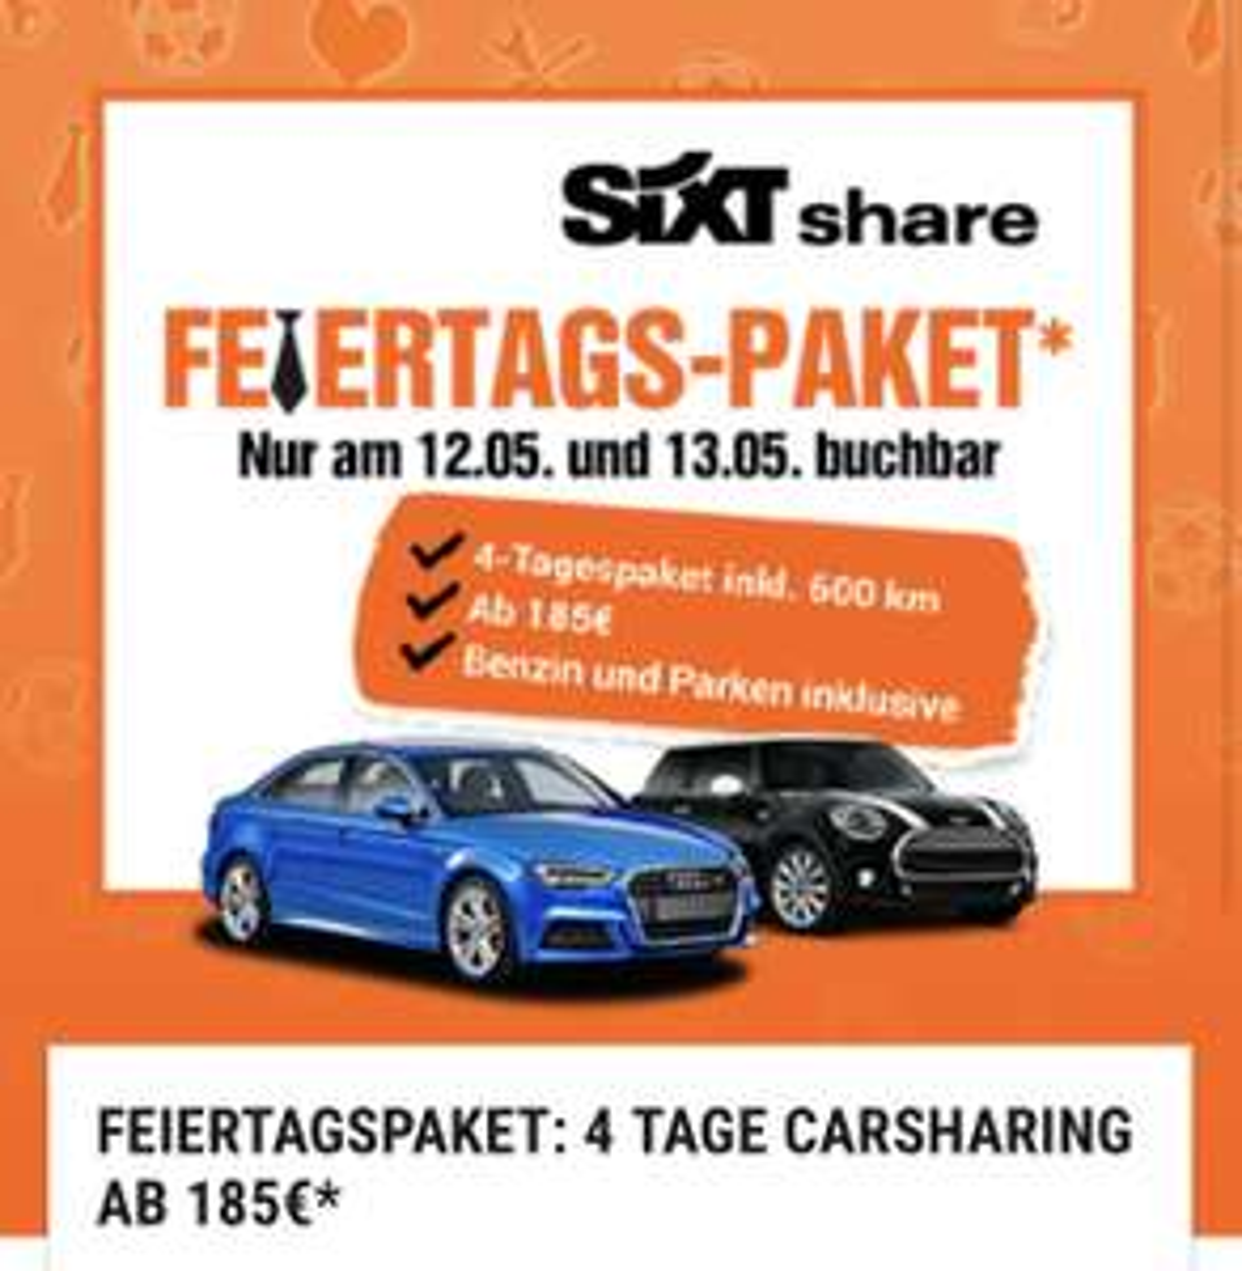 [Berlin, München, Hamburg] SIXT Share 4 Tage Feiertagsmiete 185€ inkl. Benzin